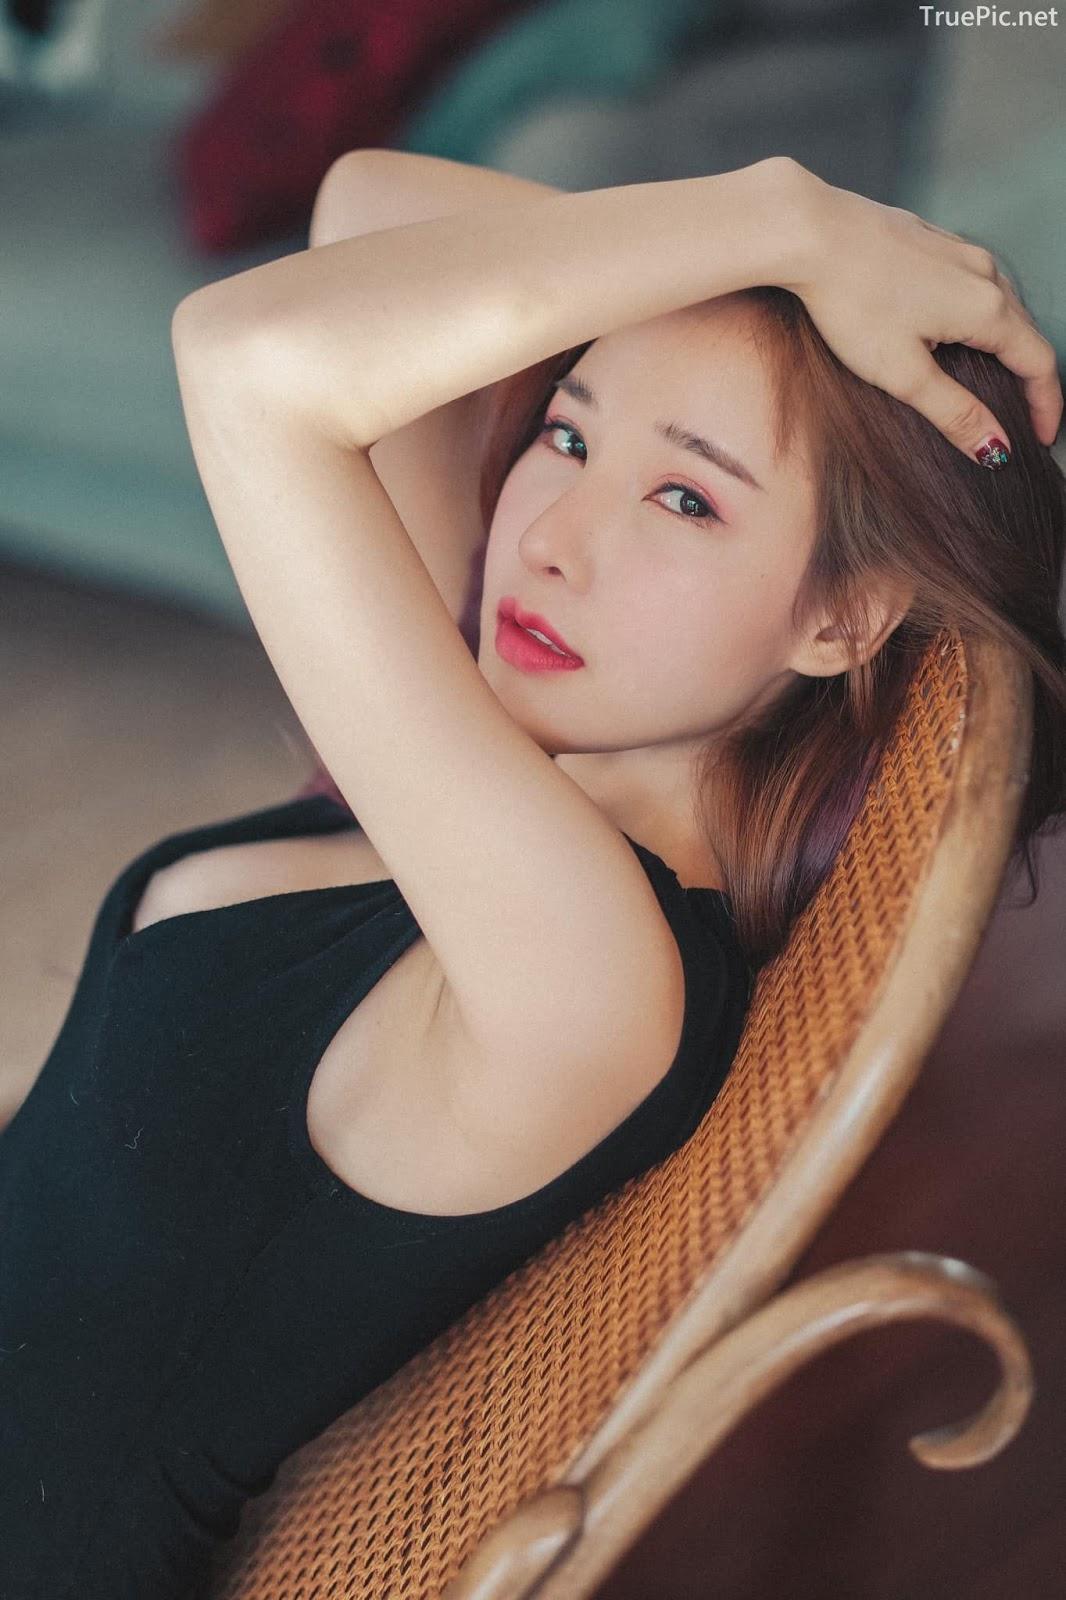 Thailand model - Arys Nam-in (Arysiacara) - Black Rose feeling the sun - Picture 9